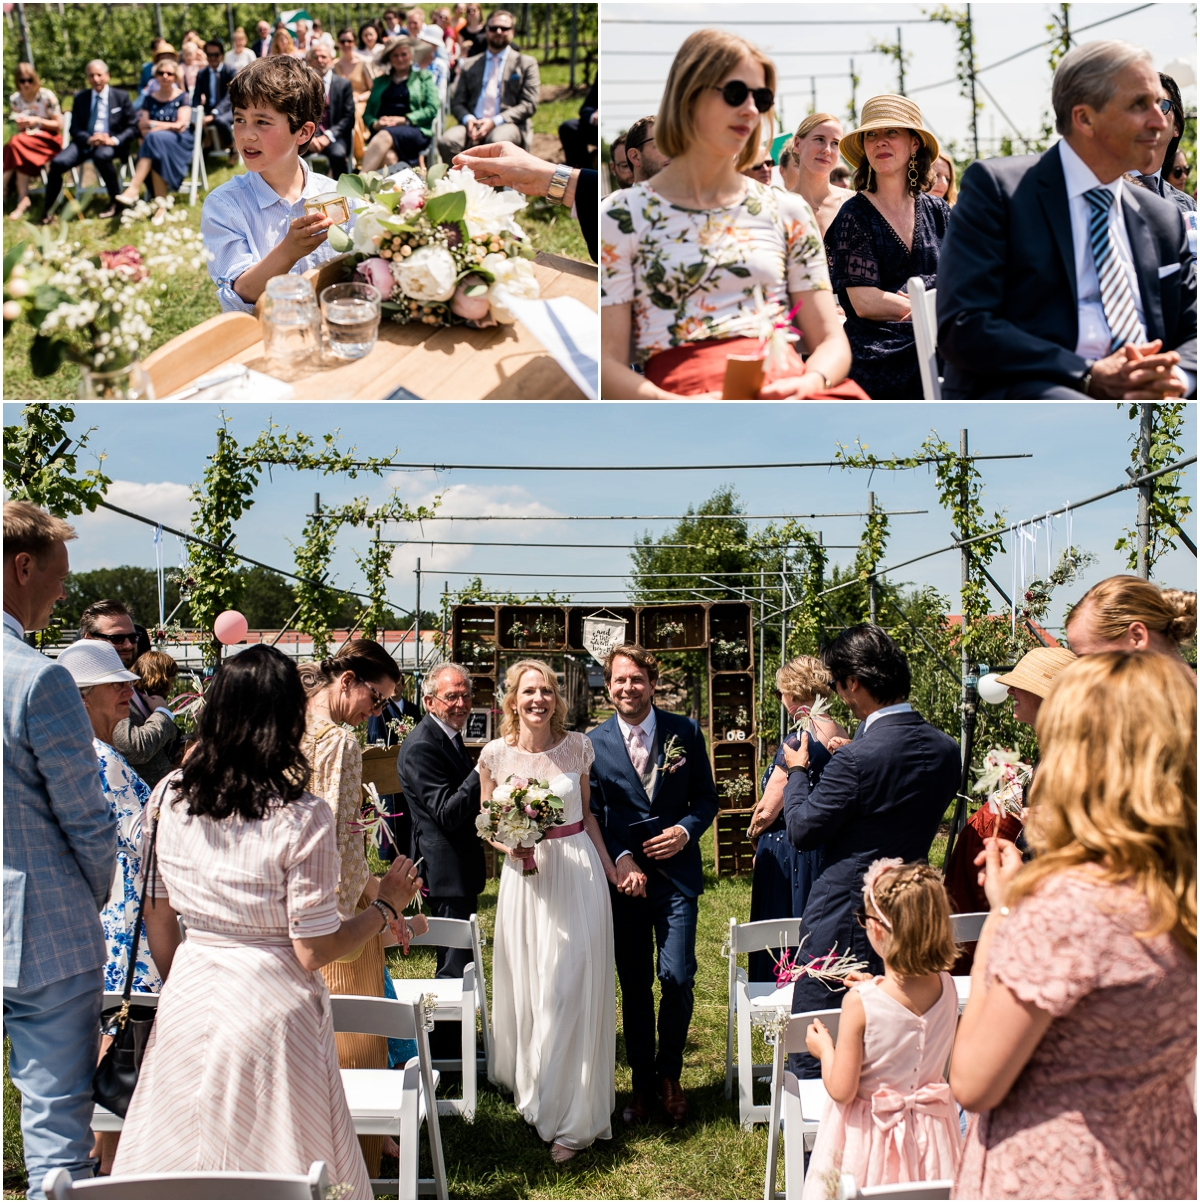 Dayofmylife-trouwen-fruittuinverbeek-bruidsfotograaf-wedding-germany-dutch11